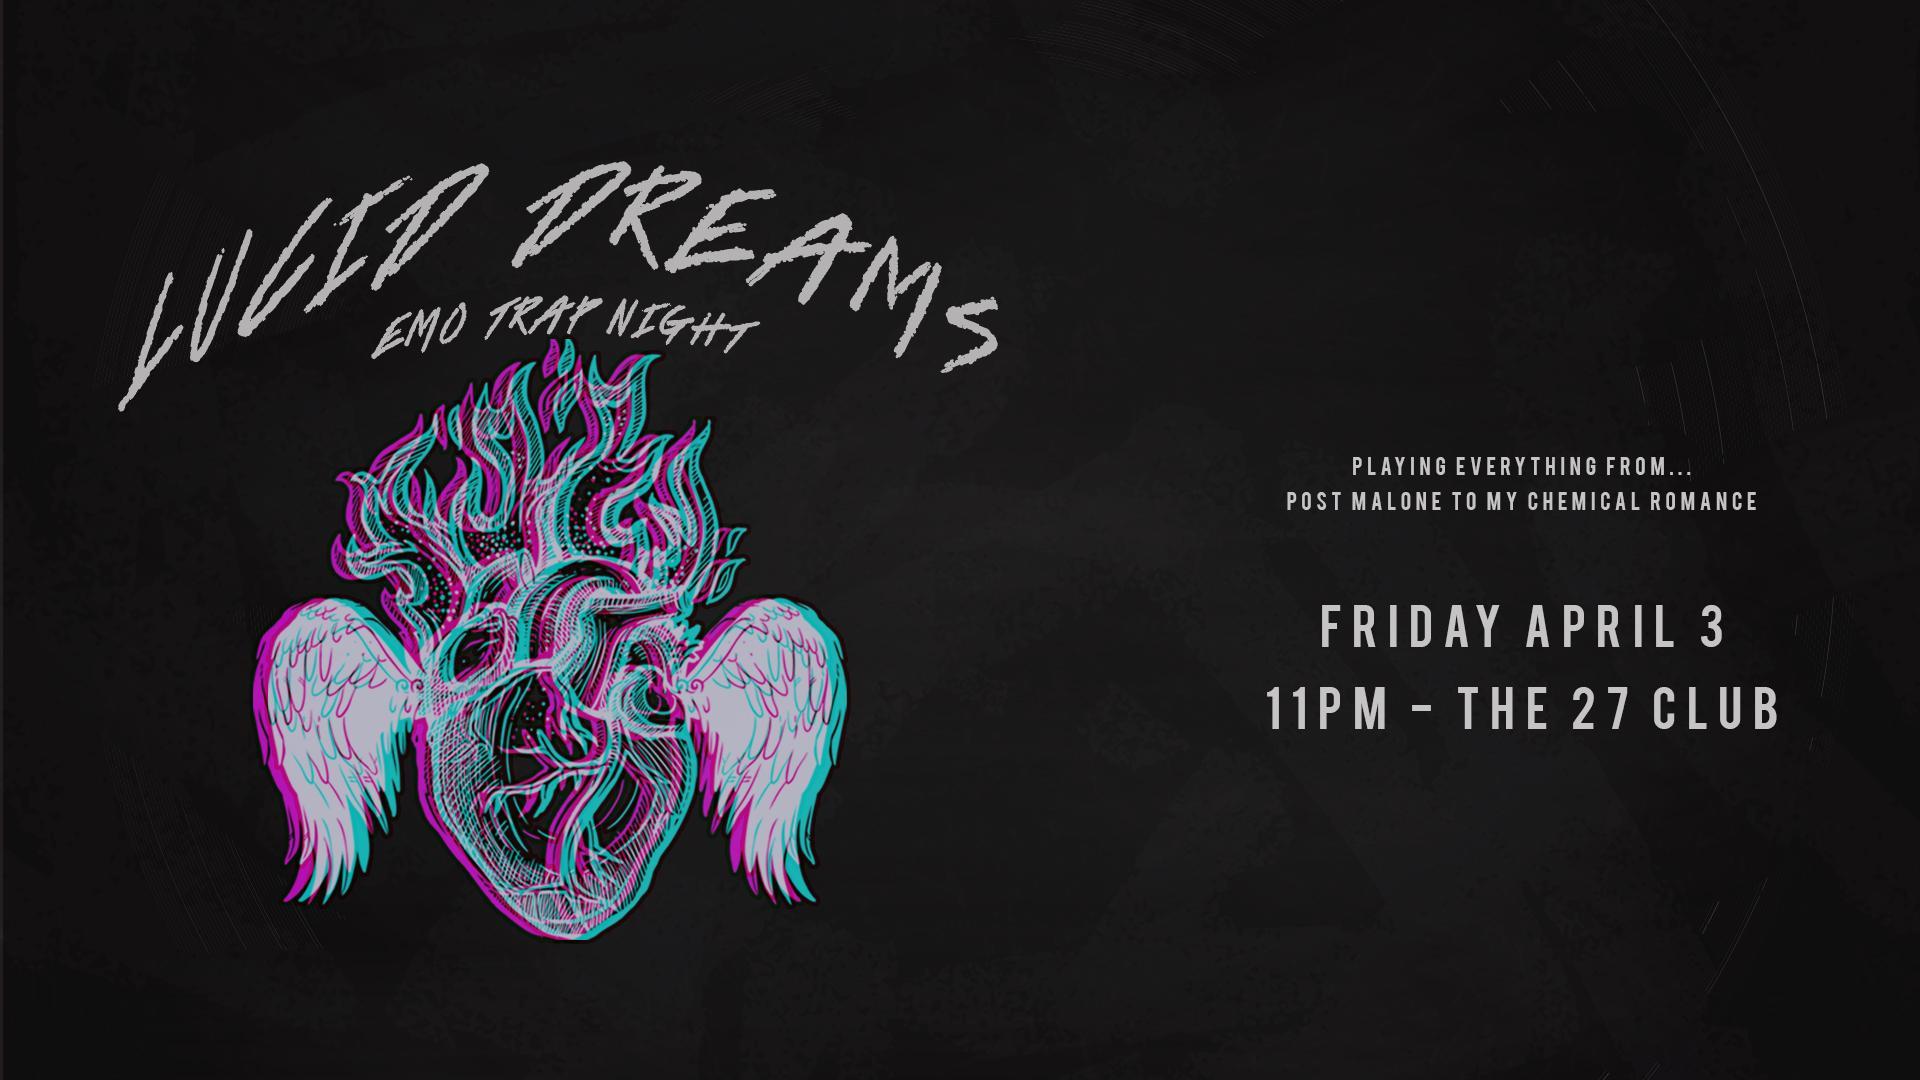 Lucid Dreams: Emo X Trap Night - cancelled